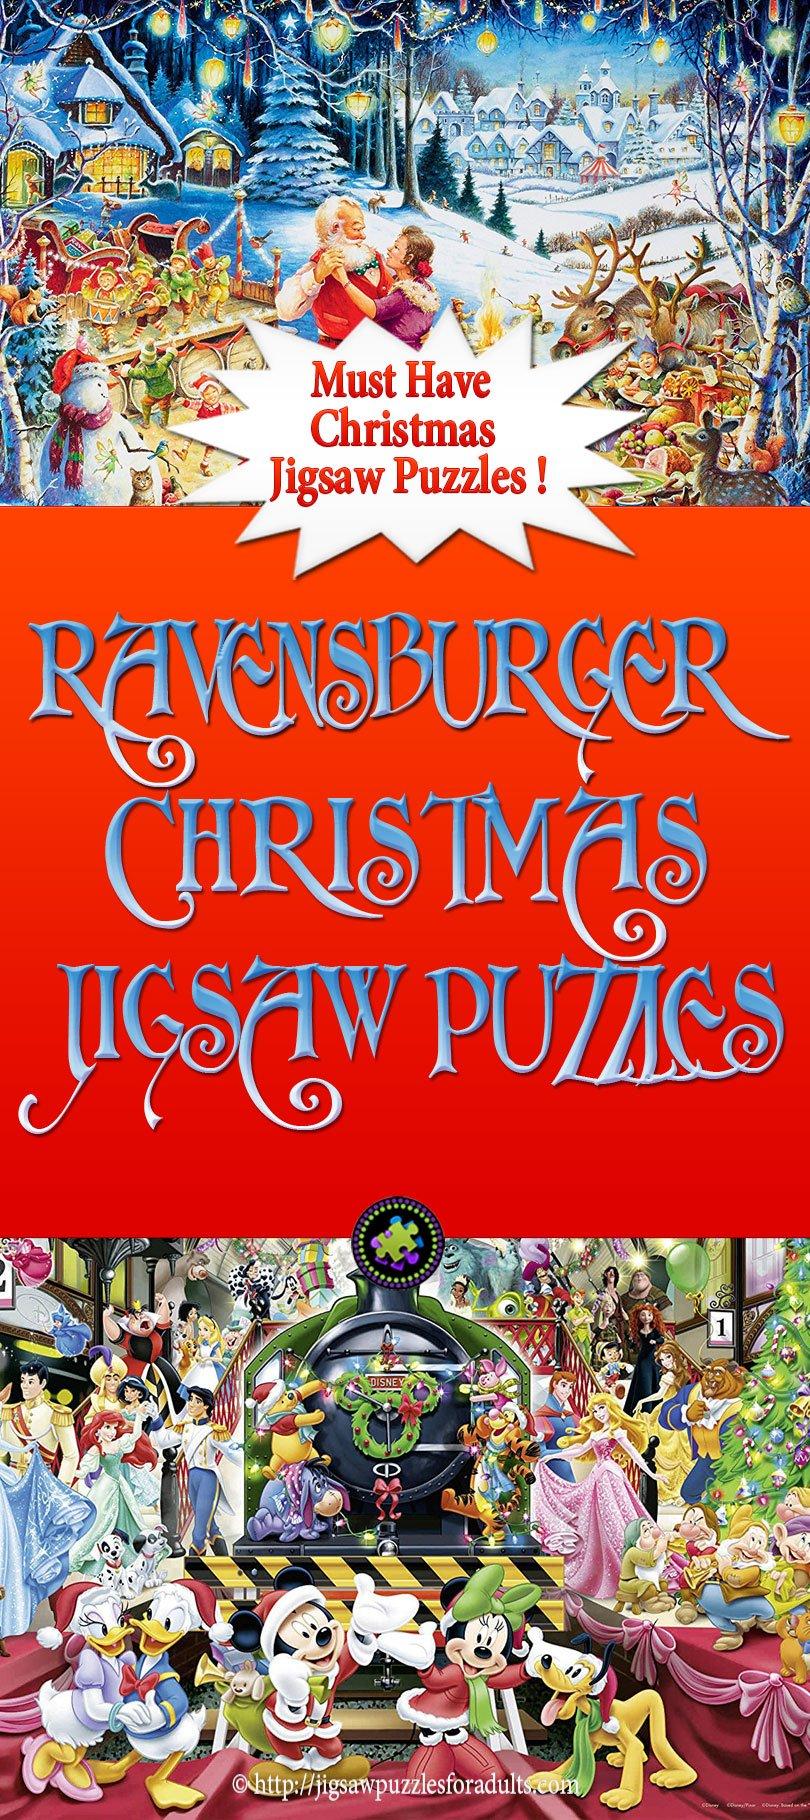 Ravensburger Christmas Jigsaw Puzzles